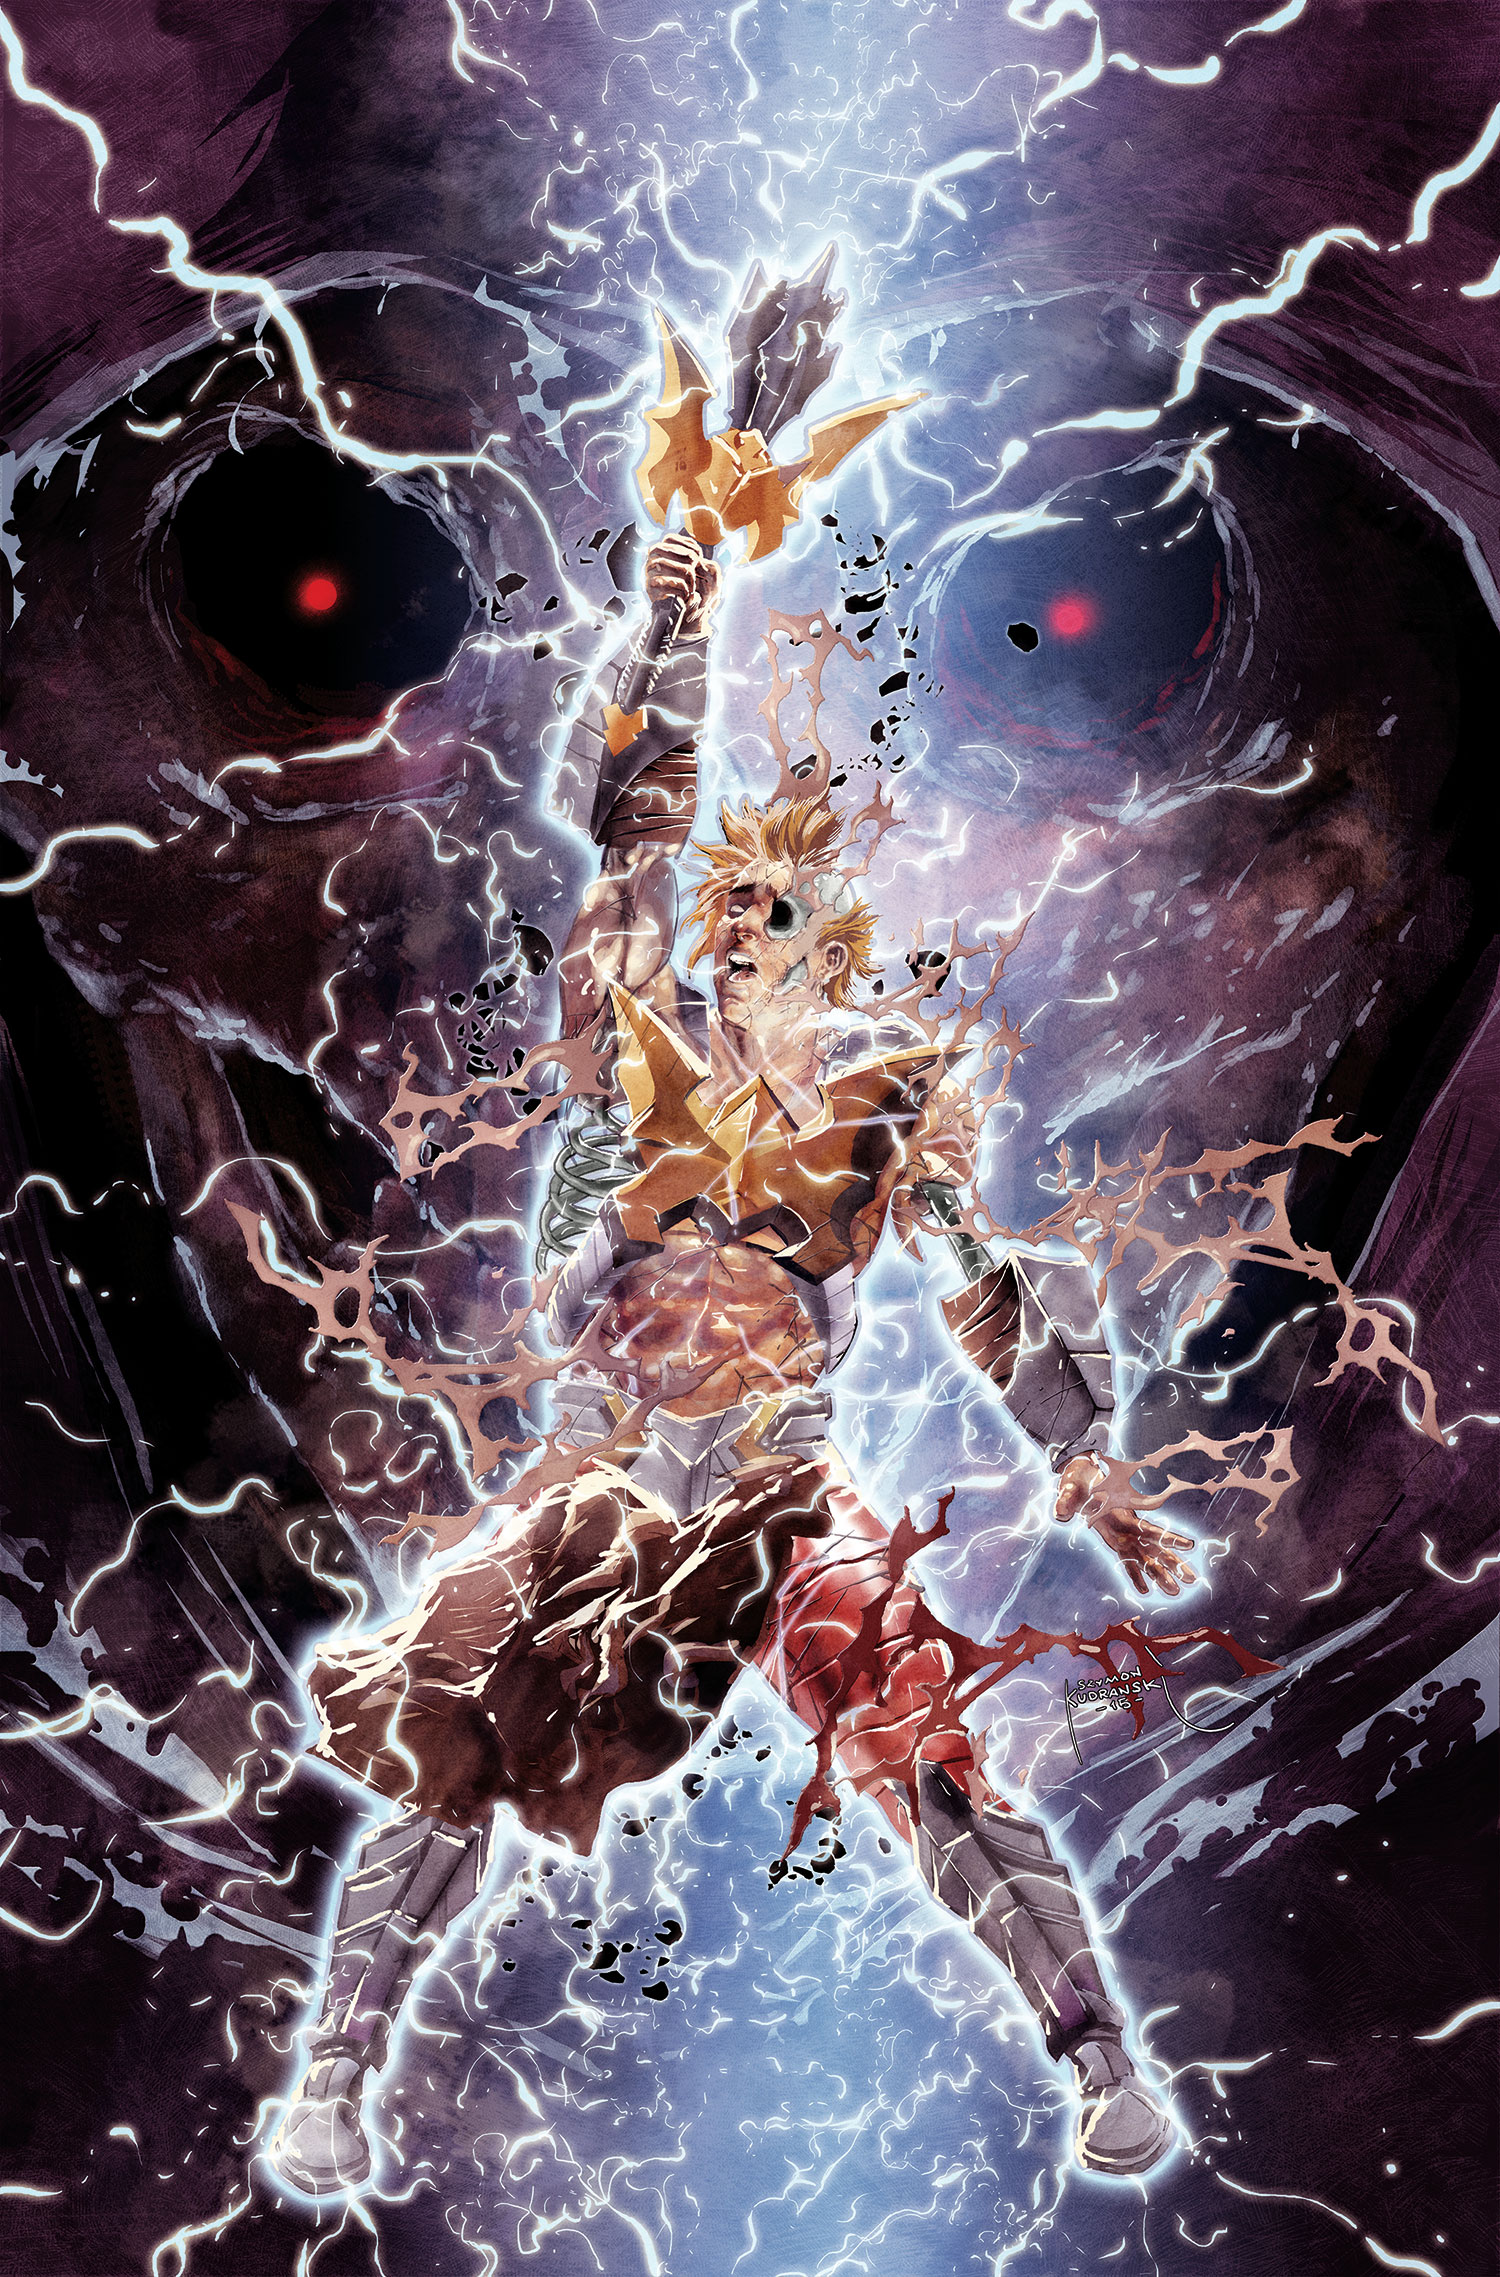 He-Man The Eternity War Vol 1 13 Textless.jpg